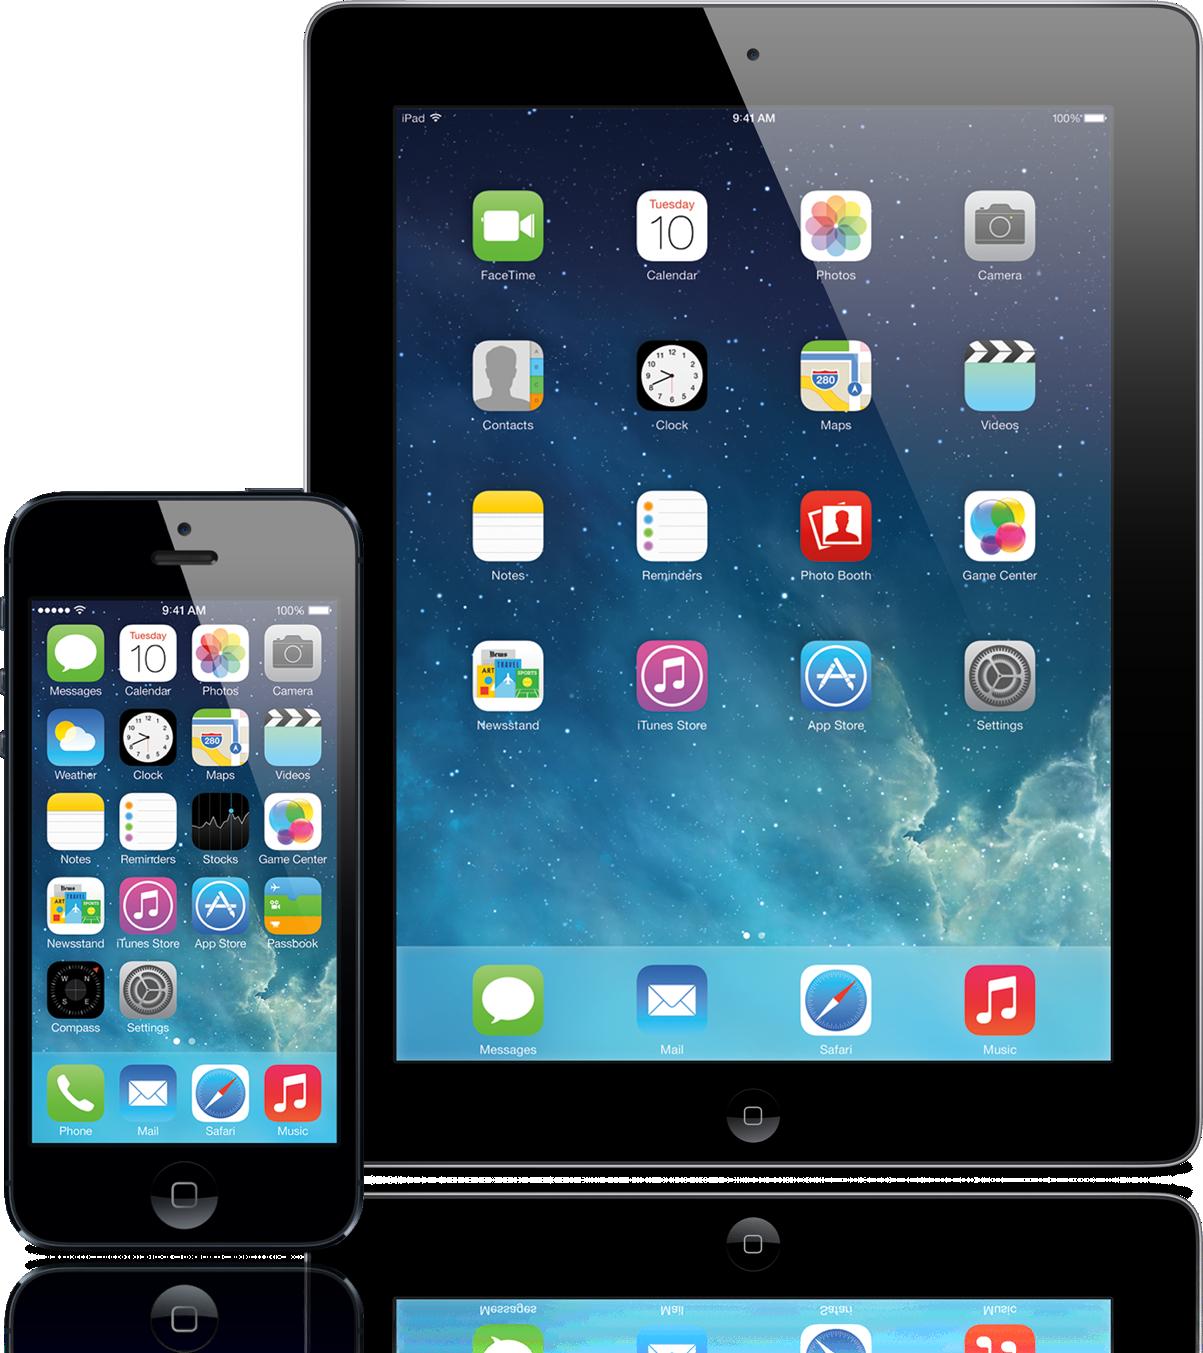 When to buy an iPhone Plus, and when to buy an iPad mini - Macworld UK